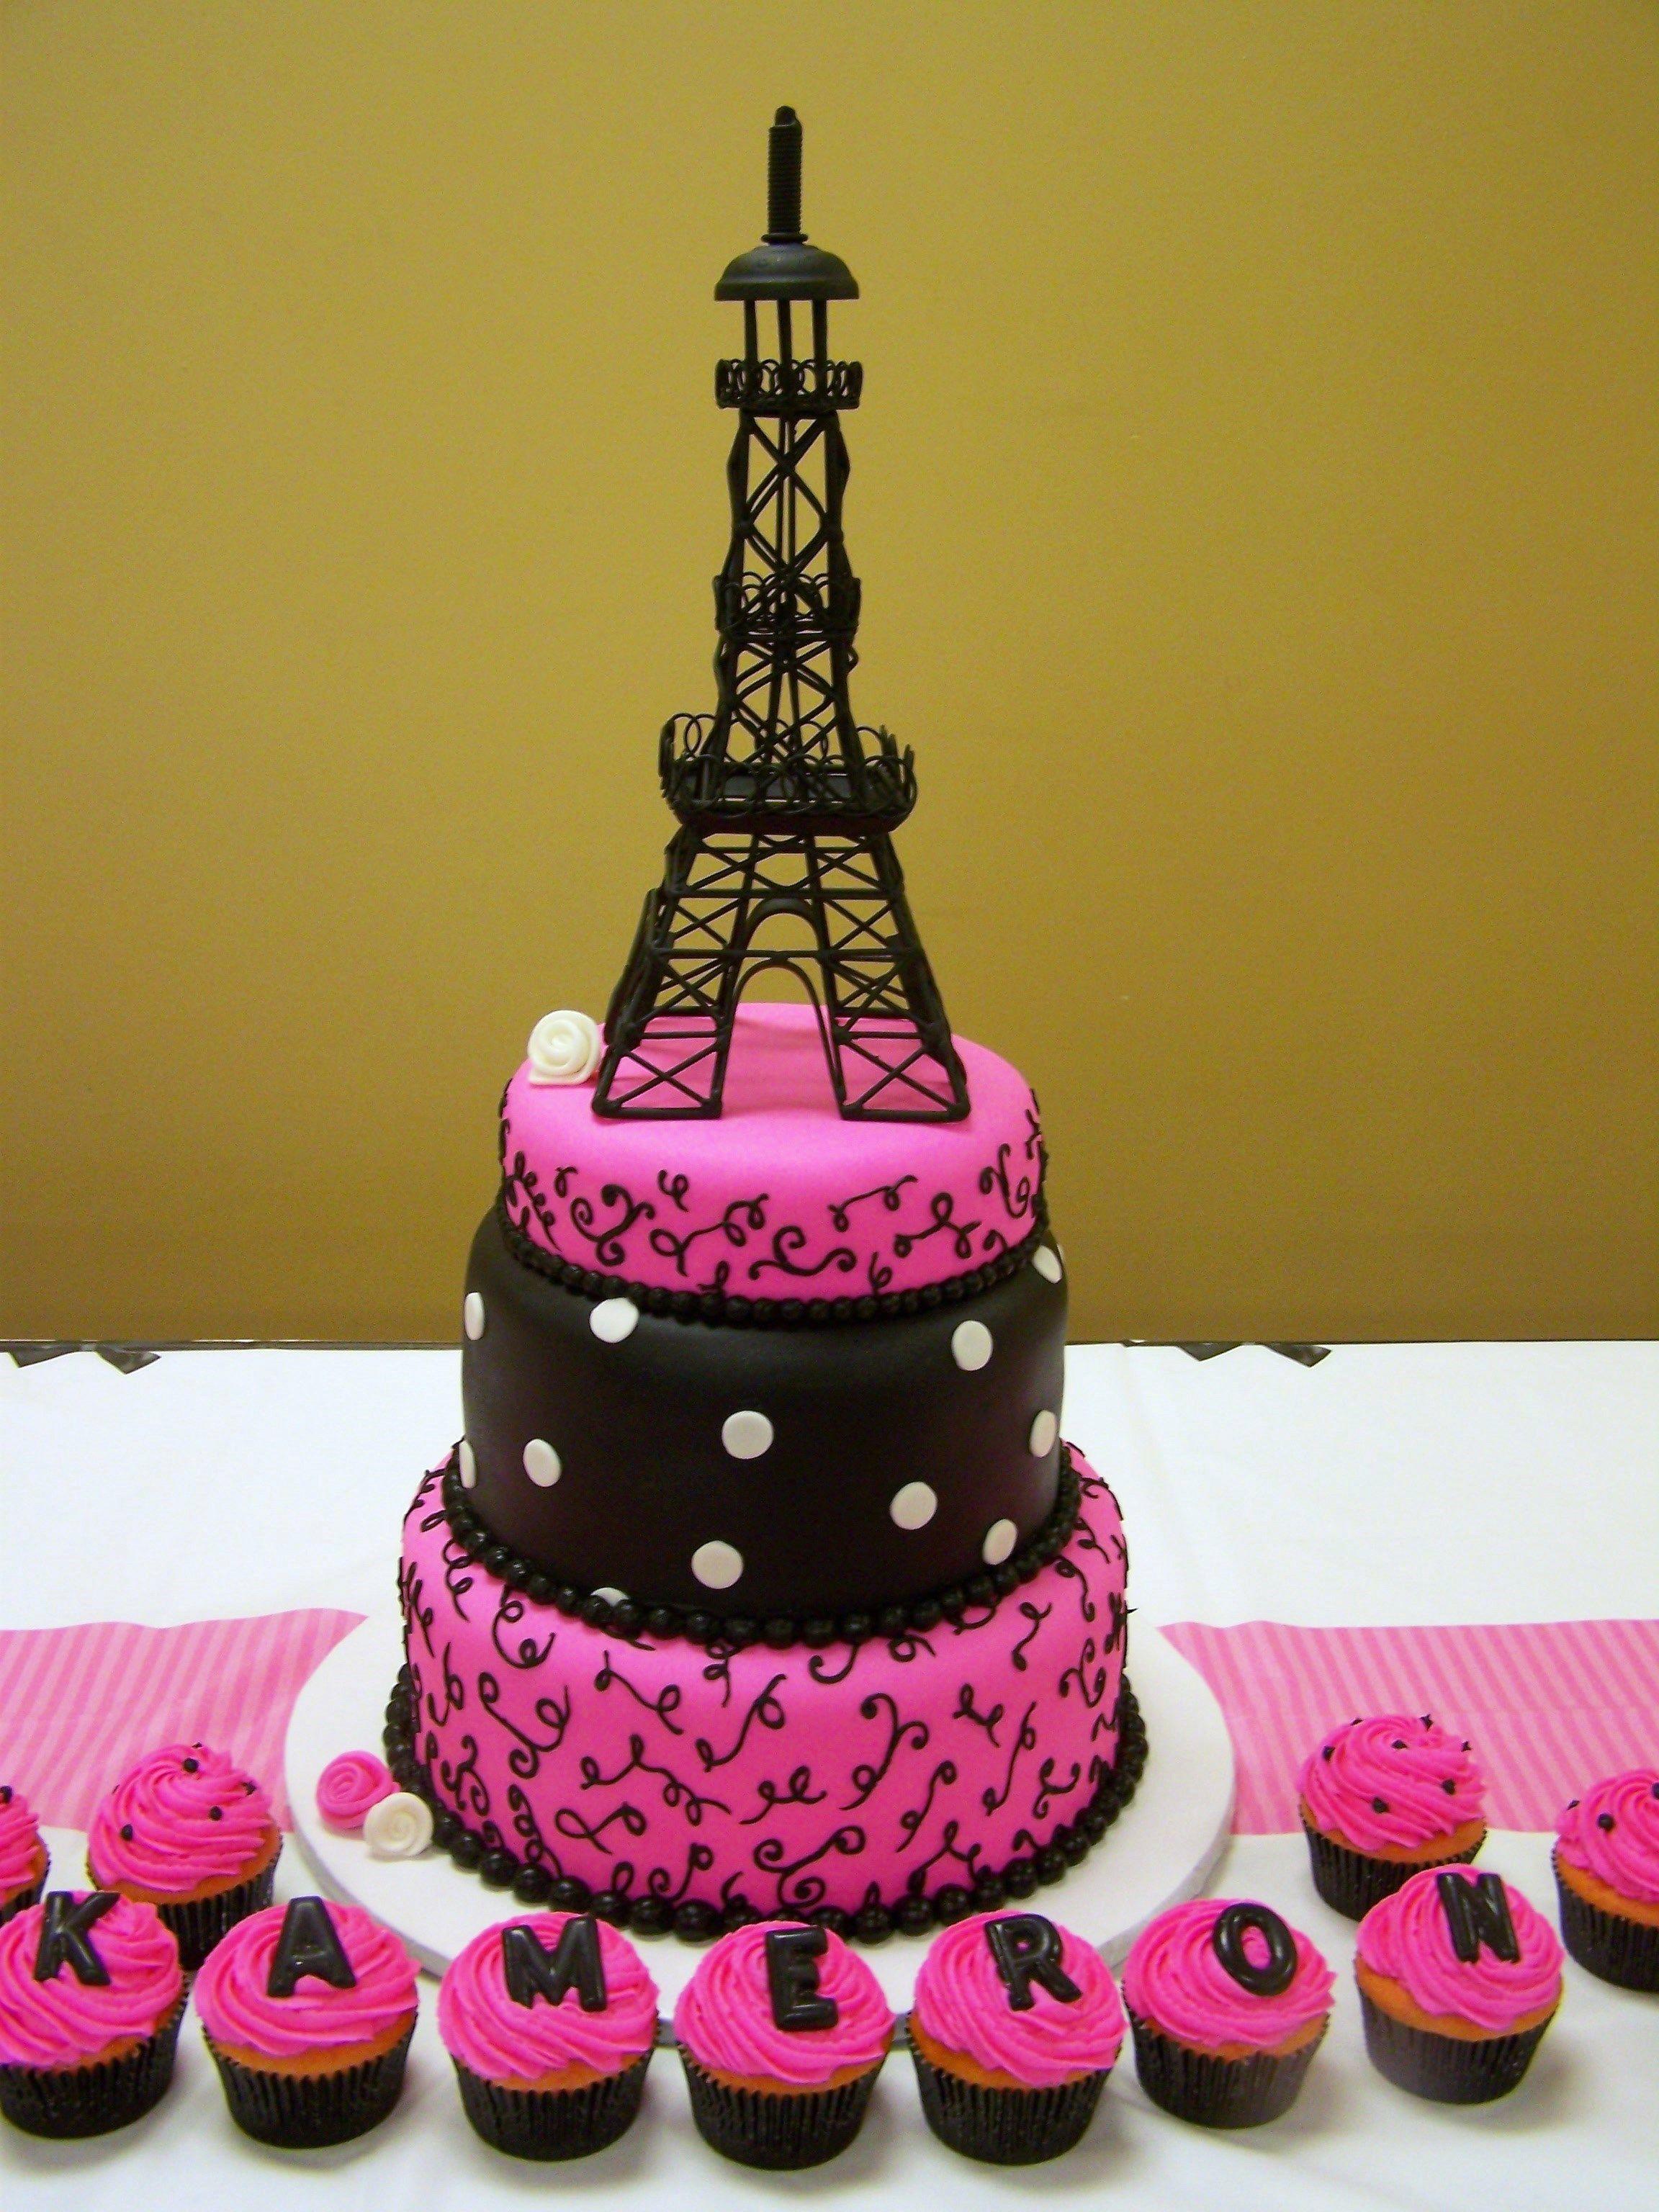 Paris Themed Cake Cakes I Ve Made Pinterest Cake